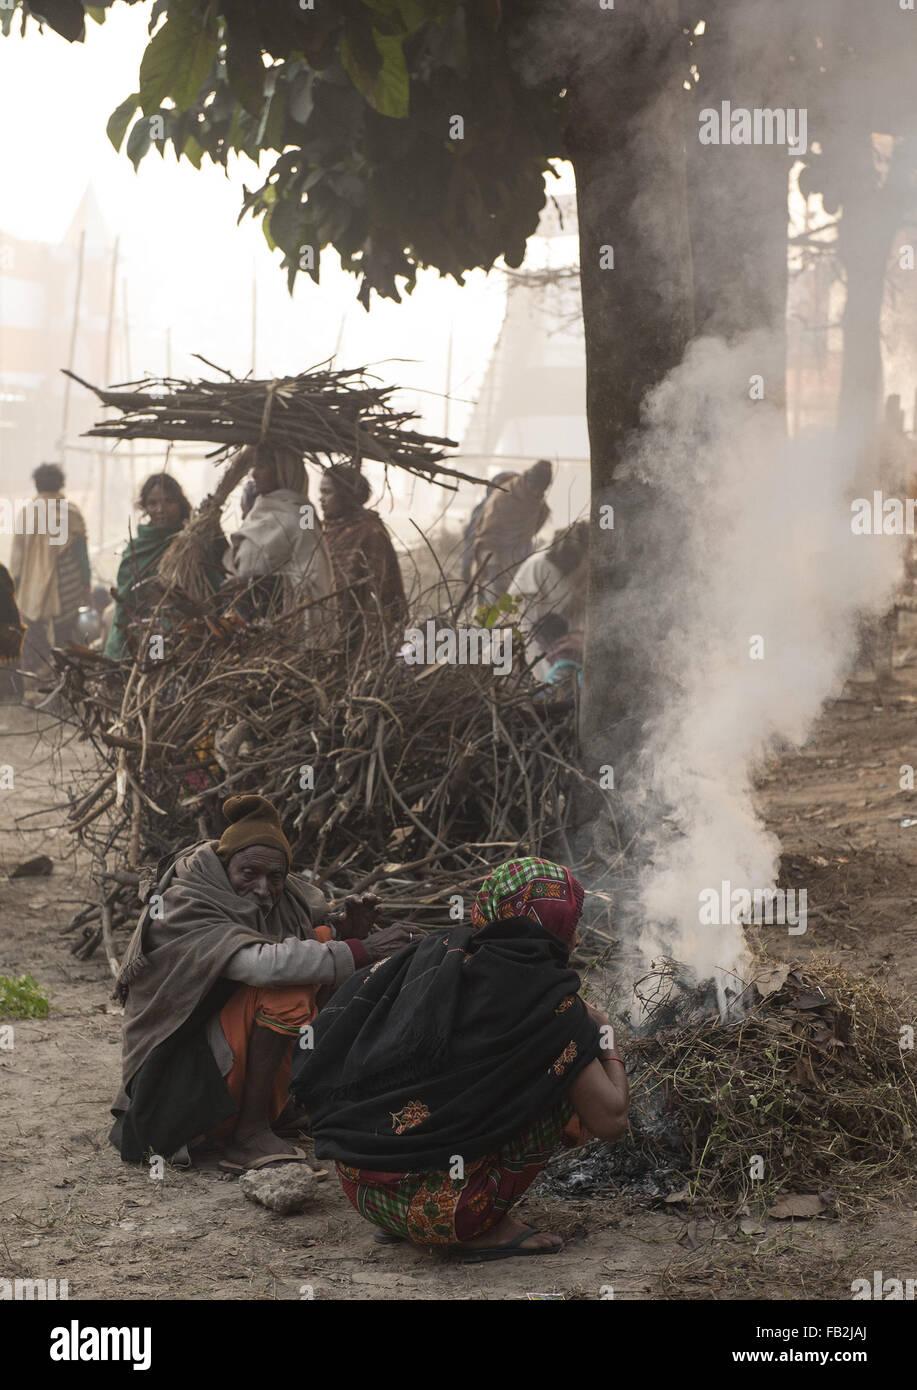 Kolkata, Indian state West Bengal. 8th Jan, 2016. Indian pilgrims warm themselves in Kolkata, capital of eastern - Stock Image